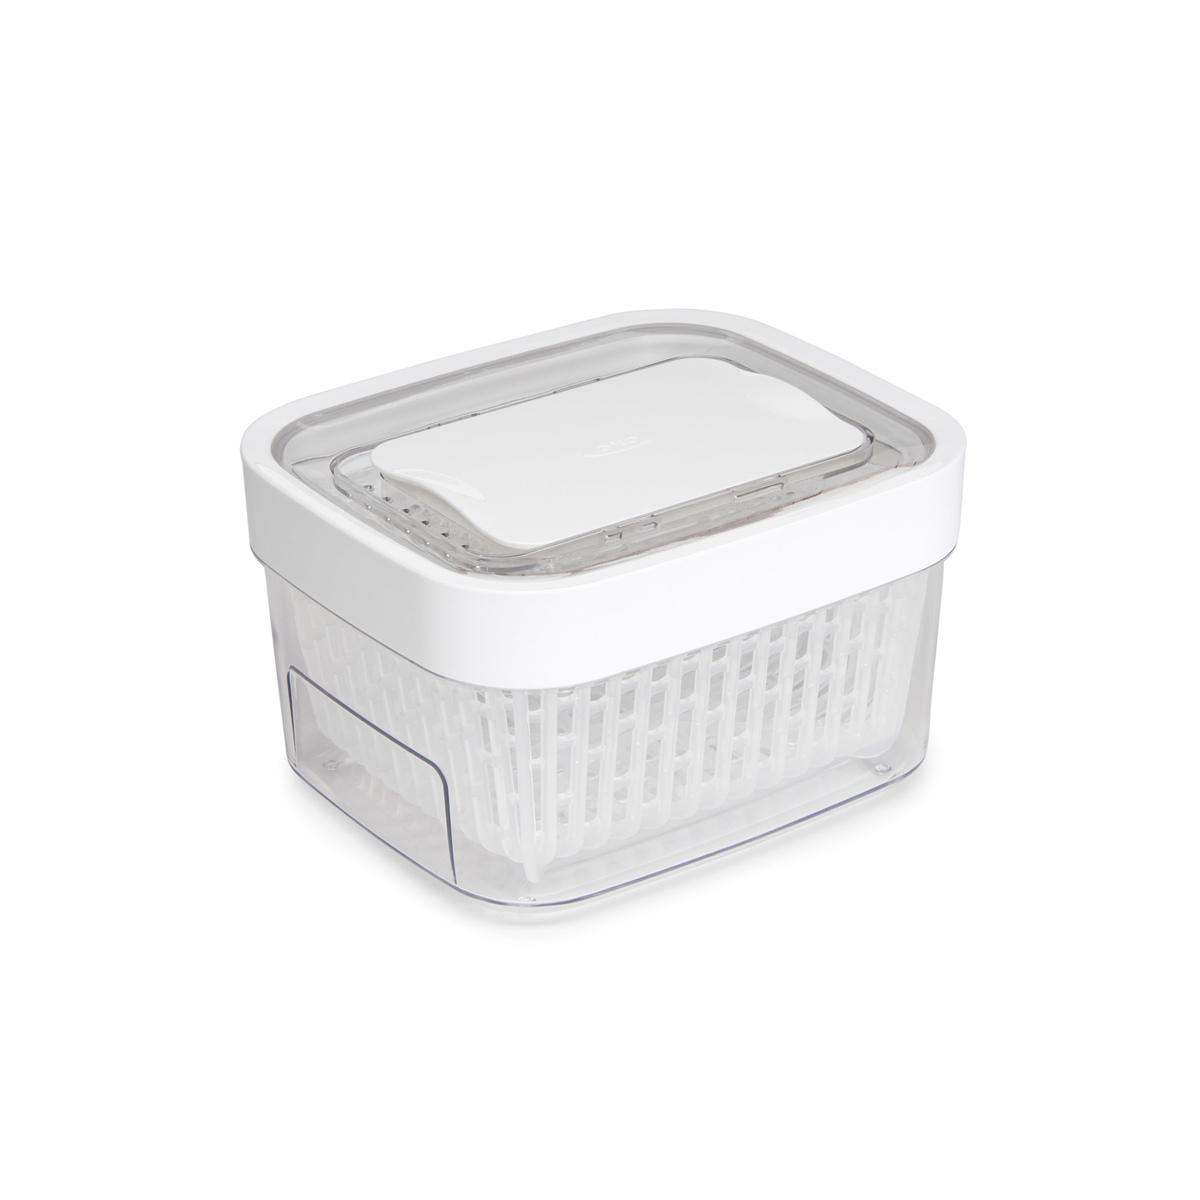 Онлайн каталог PROMENU: Контейнер для хранения с клапаном OXO FOOD STORAGE, 15х17х10 см, белый                               11139900